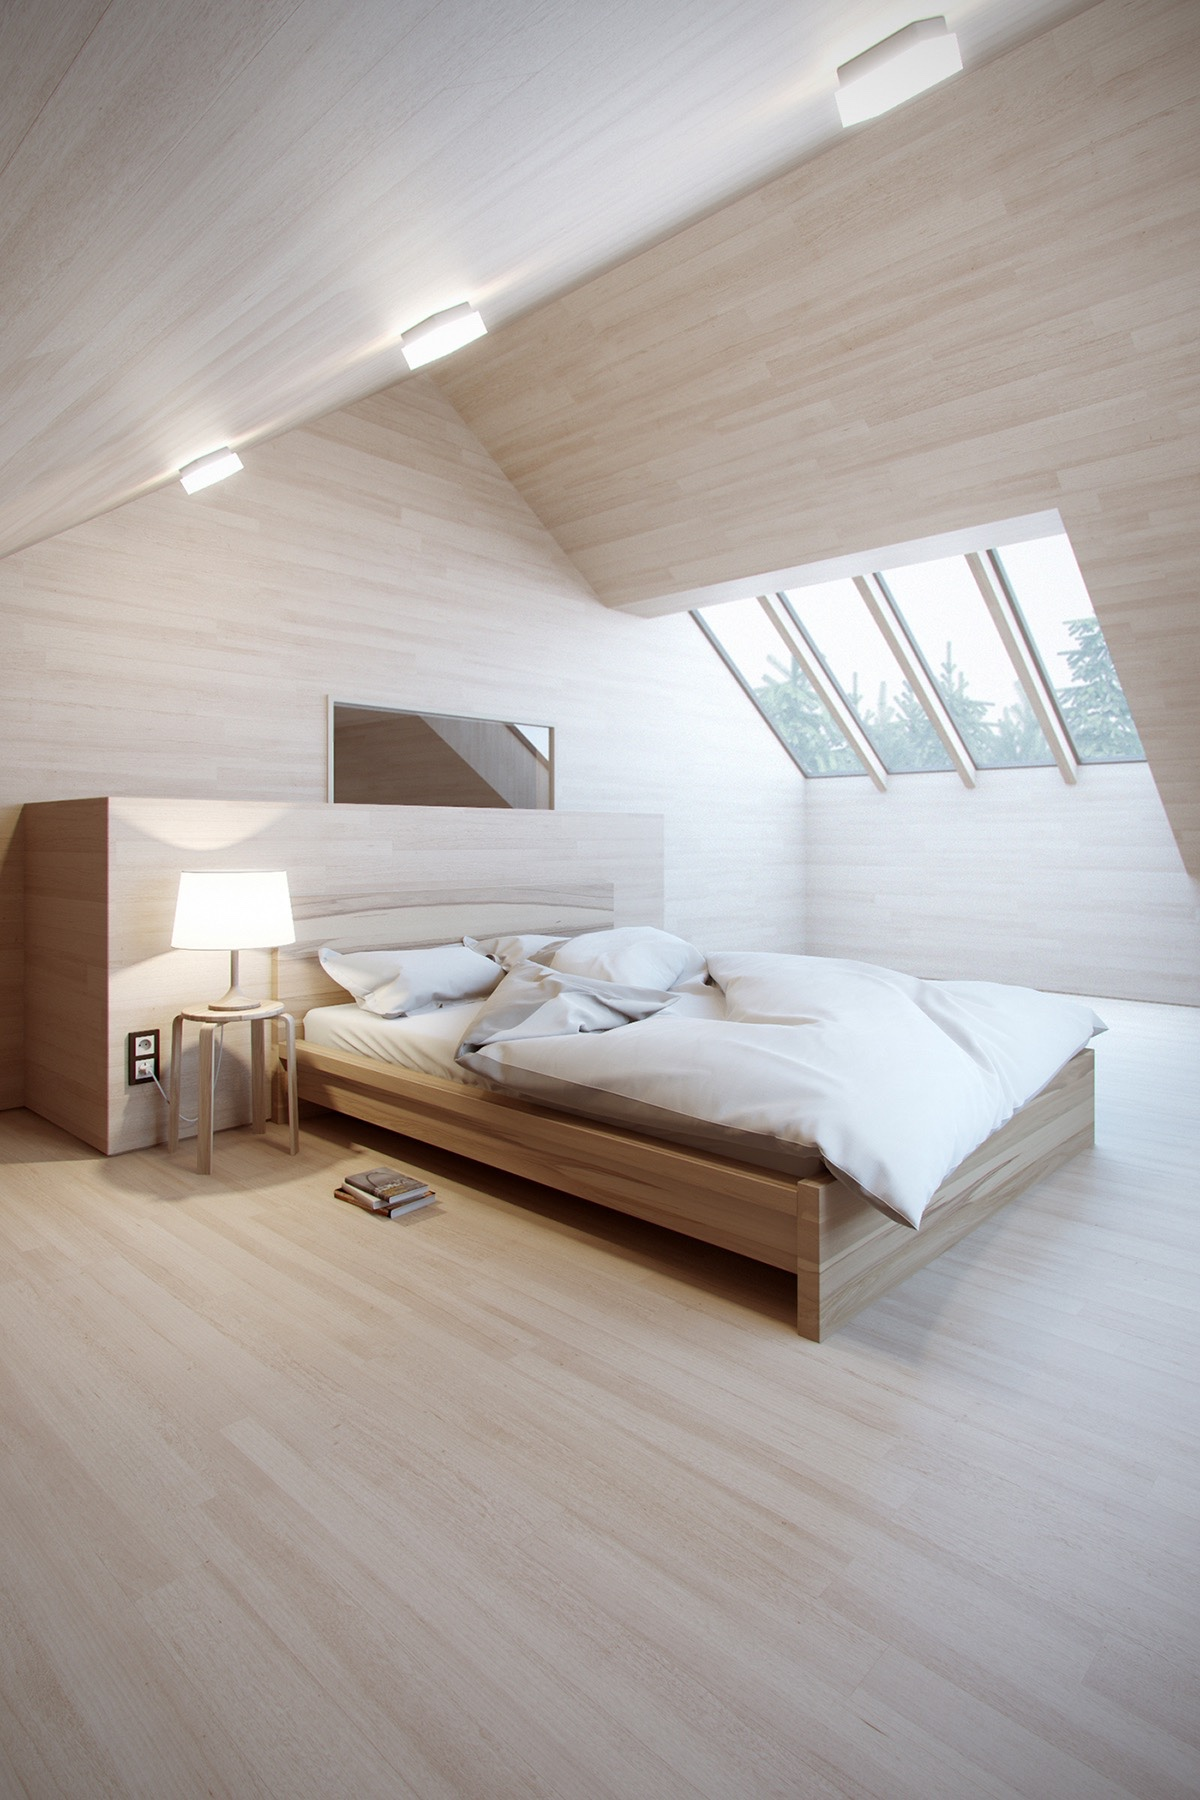 Camere da letto in mansarda - Camera da letto mansarda ...